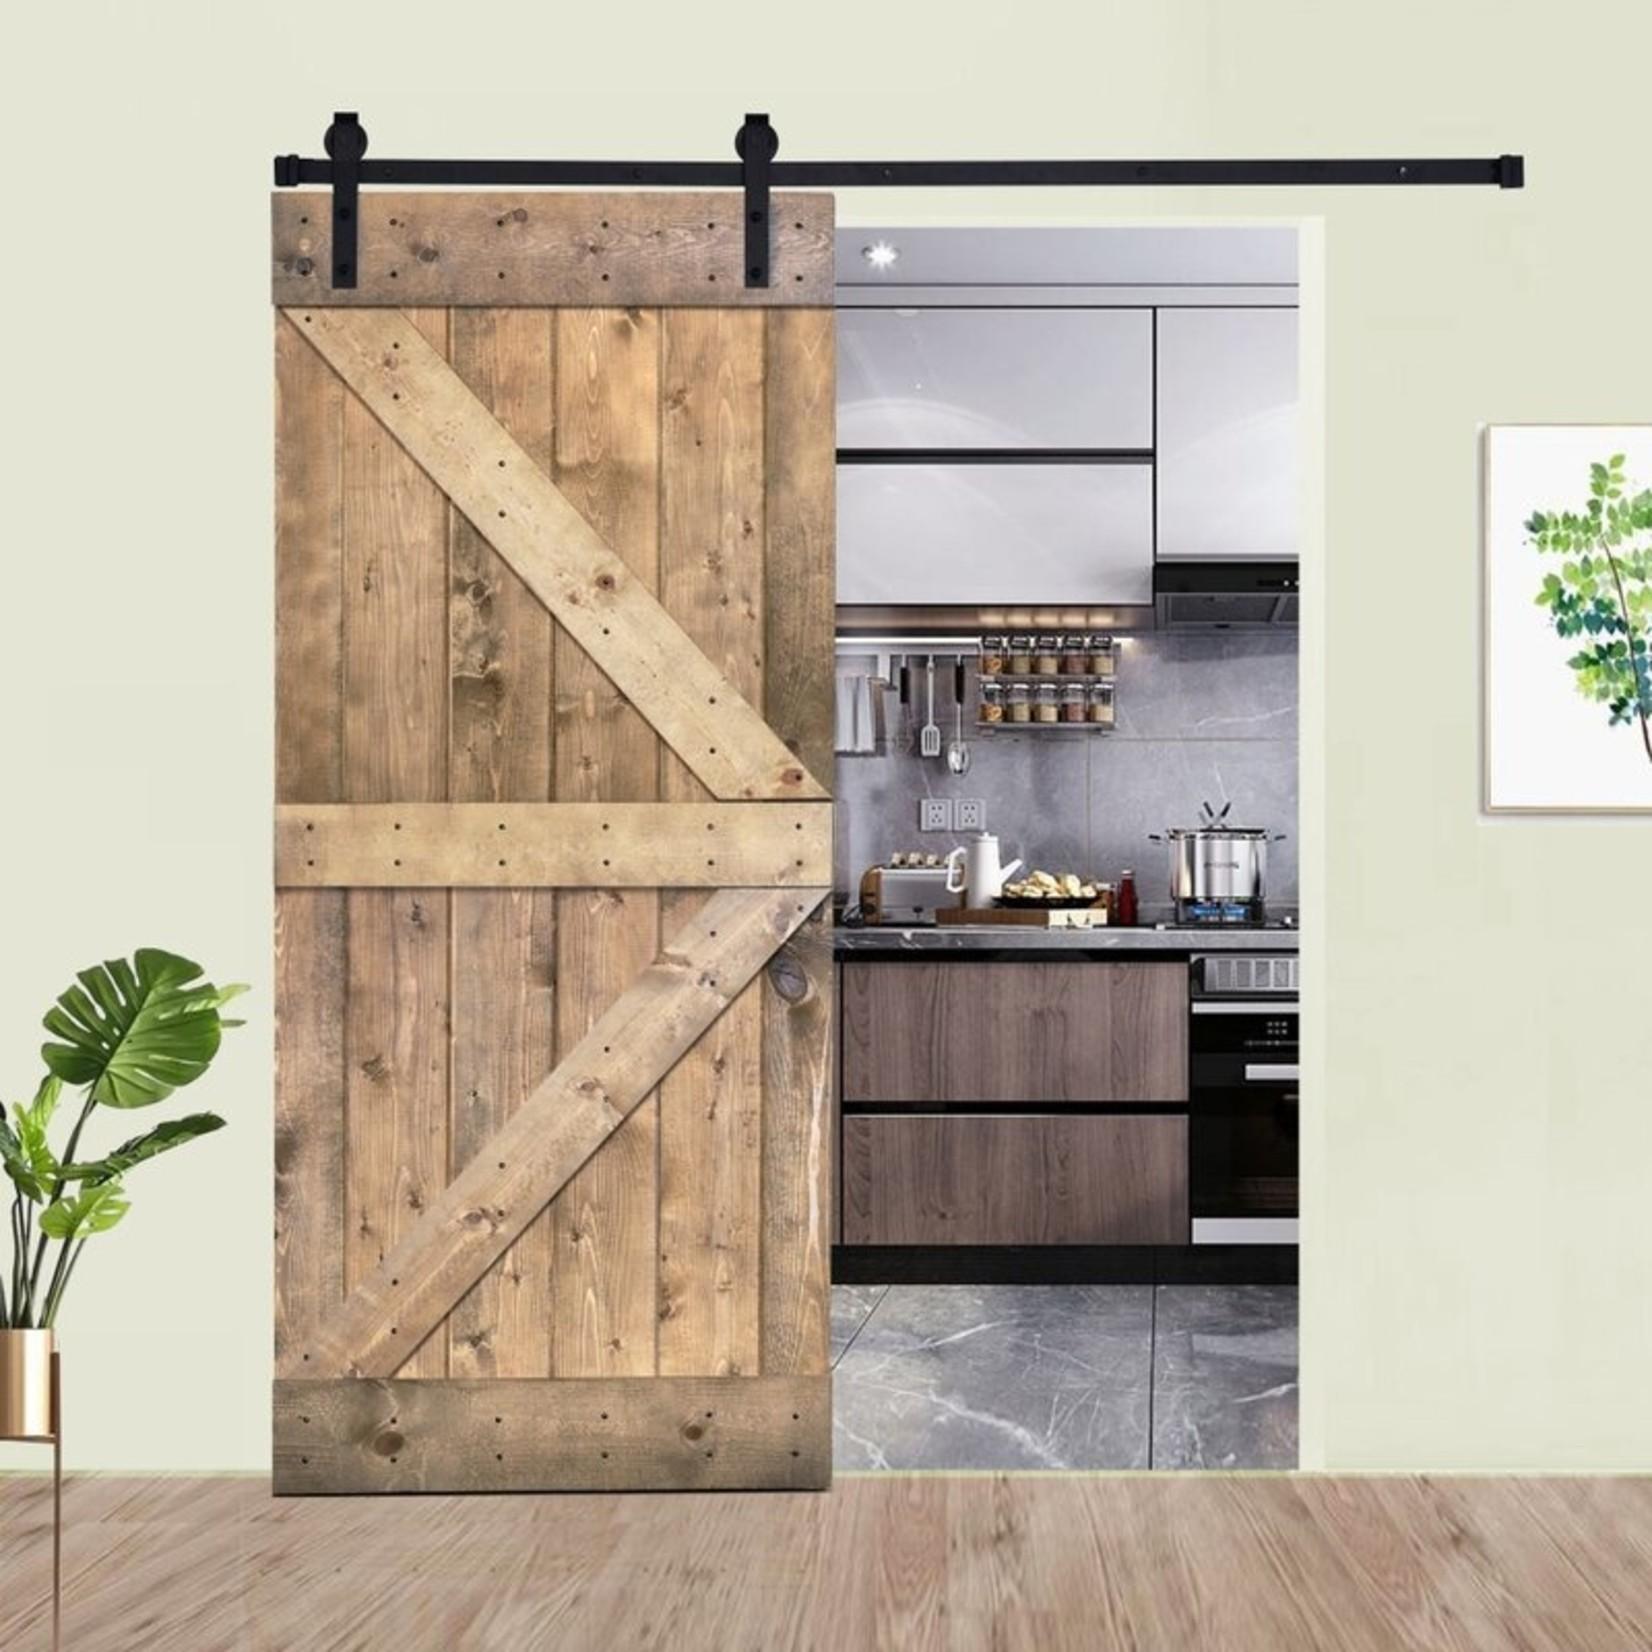 *Paneled Manufactured Wood Painted Barn Door without Installation Hardware Kit - some damaged